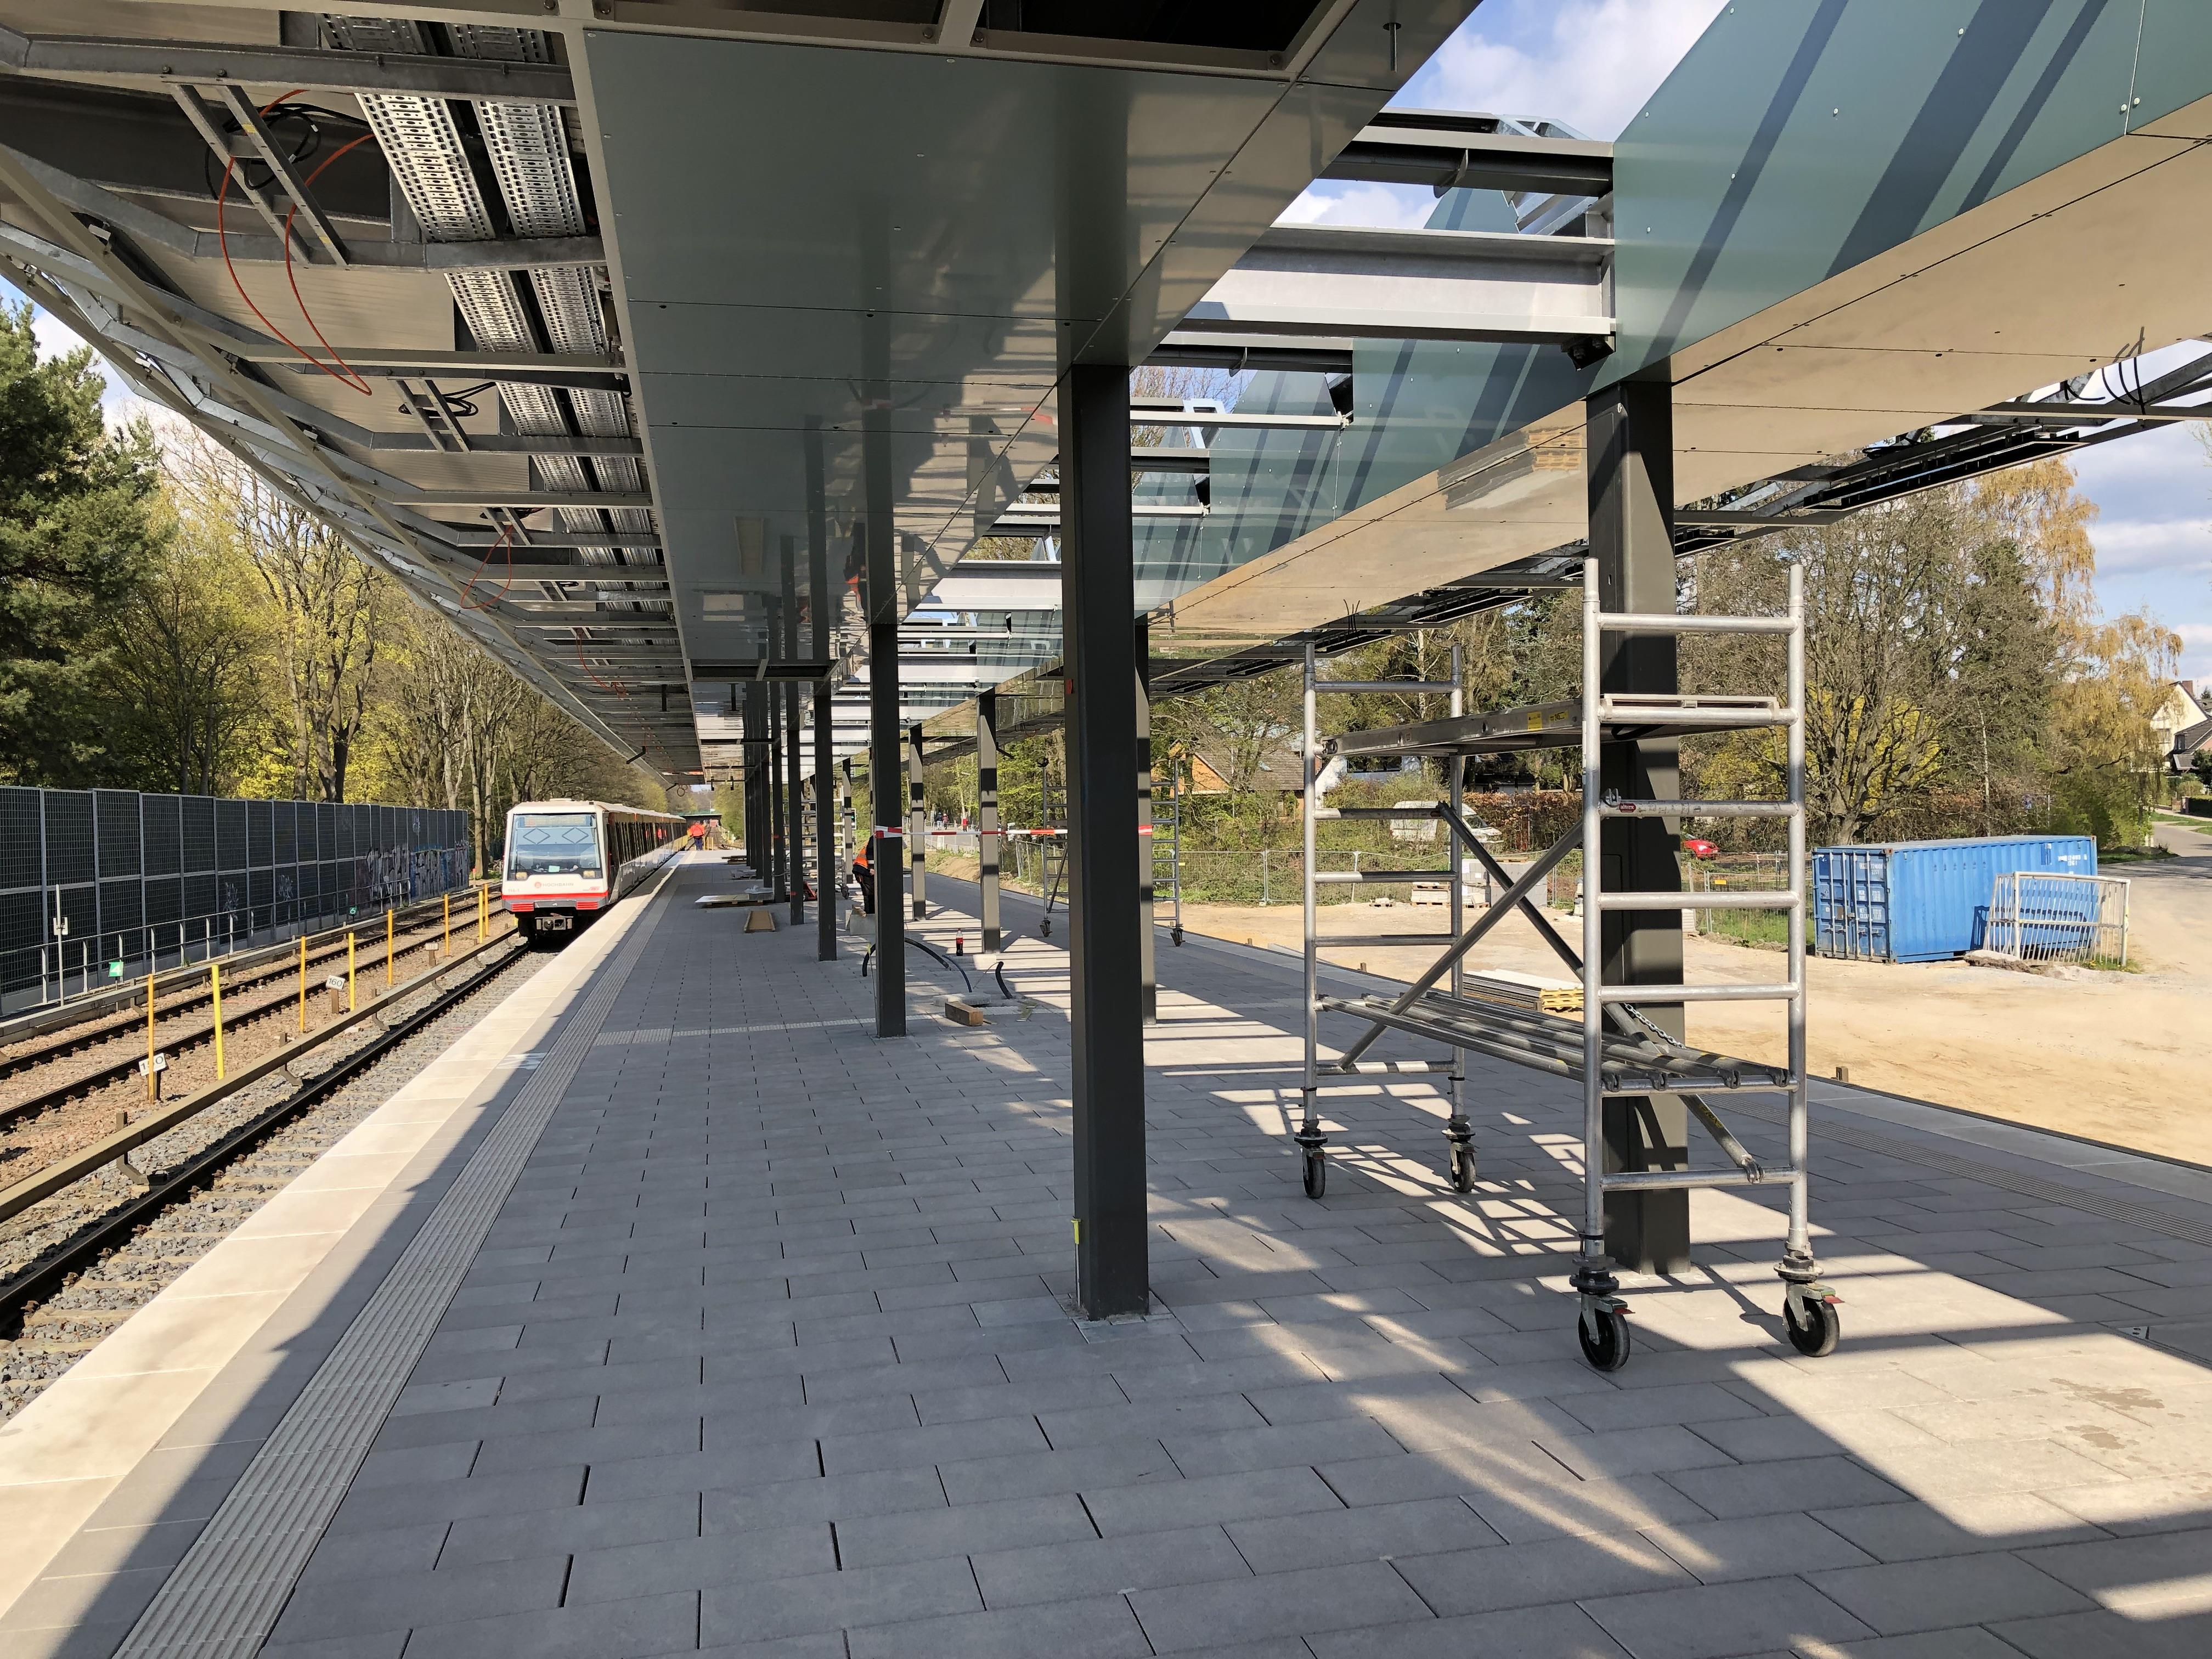 U-Bahnhaltestelle Oldenfelde